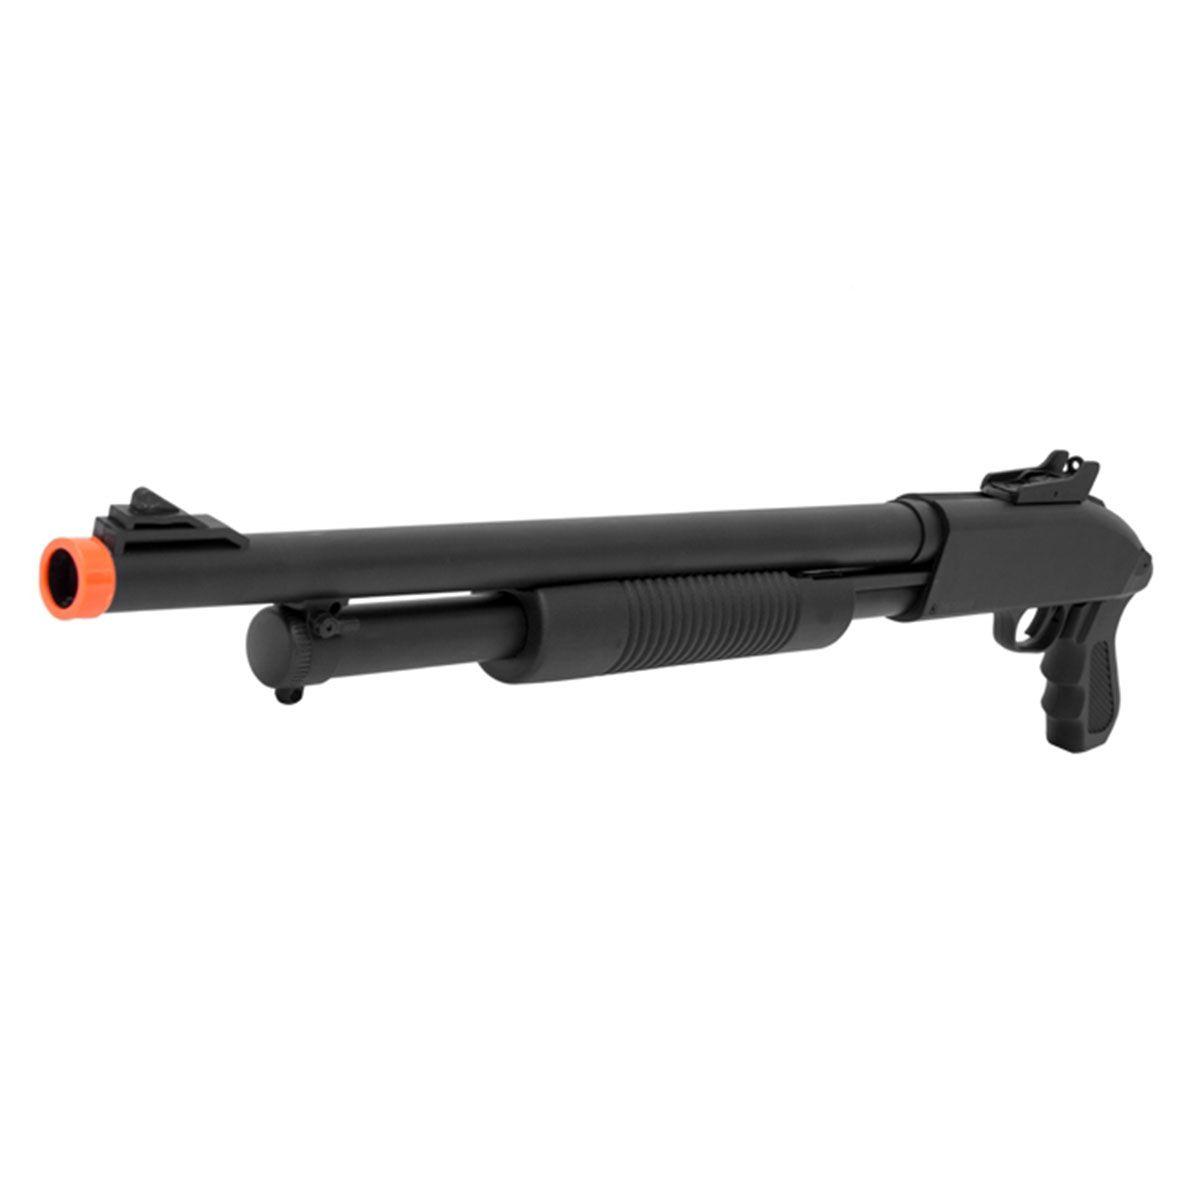 Shotgun Airsoft Cyma ZM61 Polímero Spring 6mm